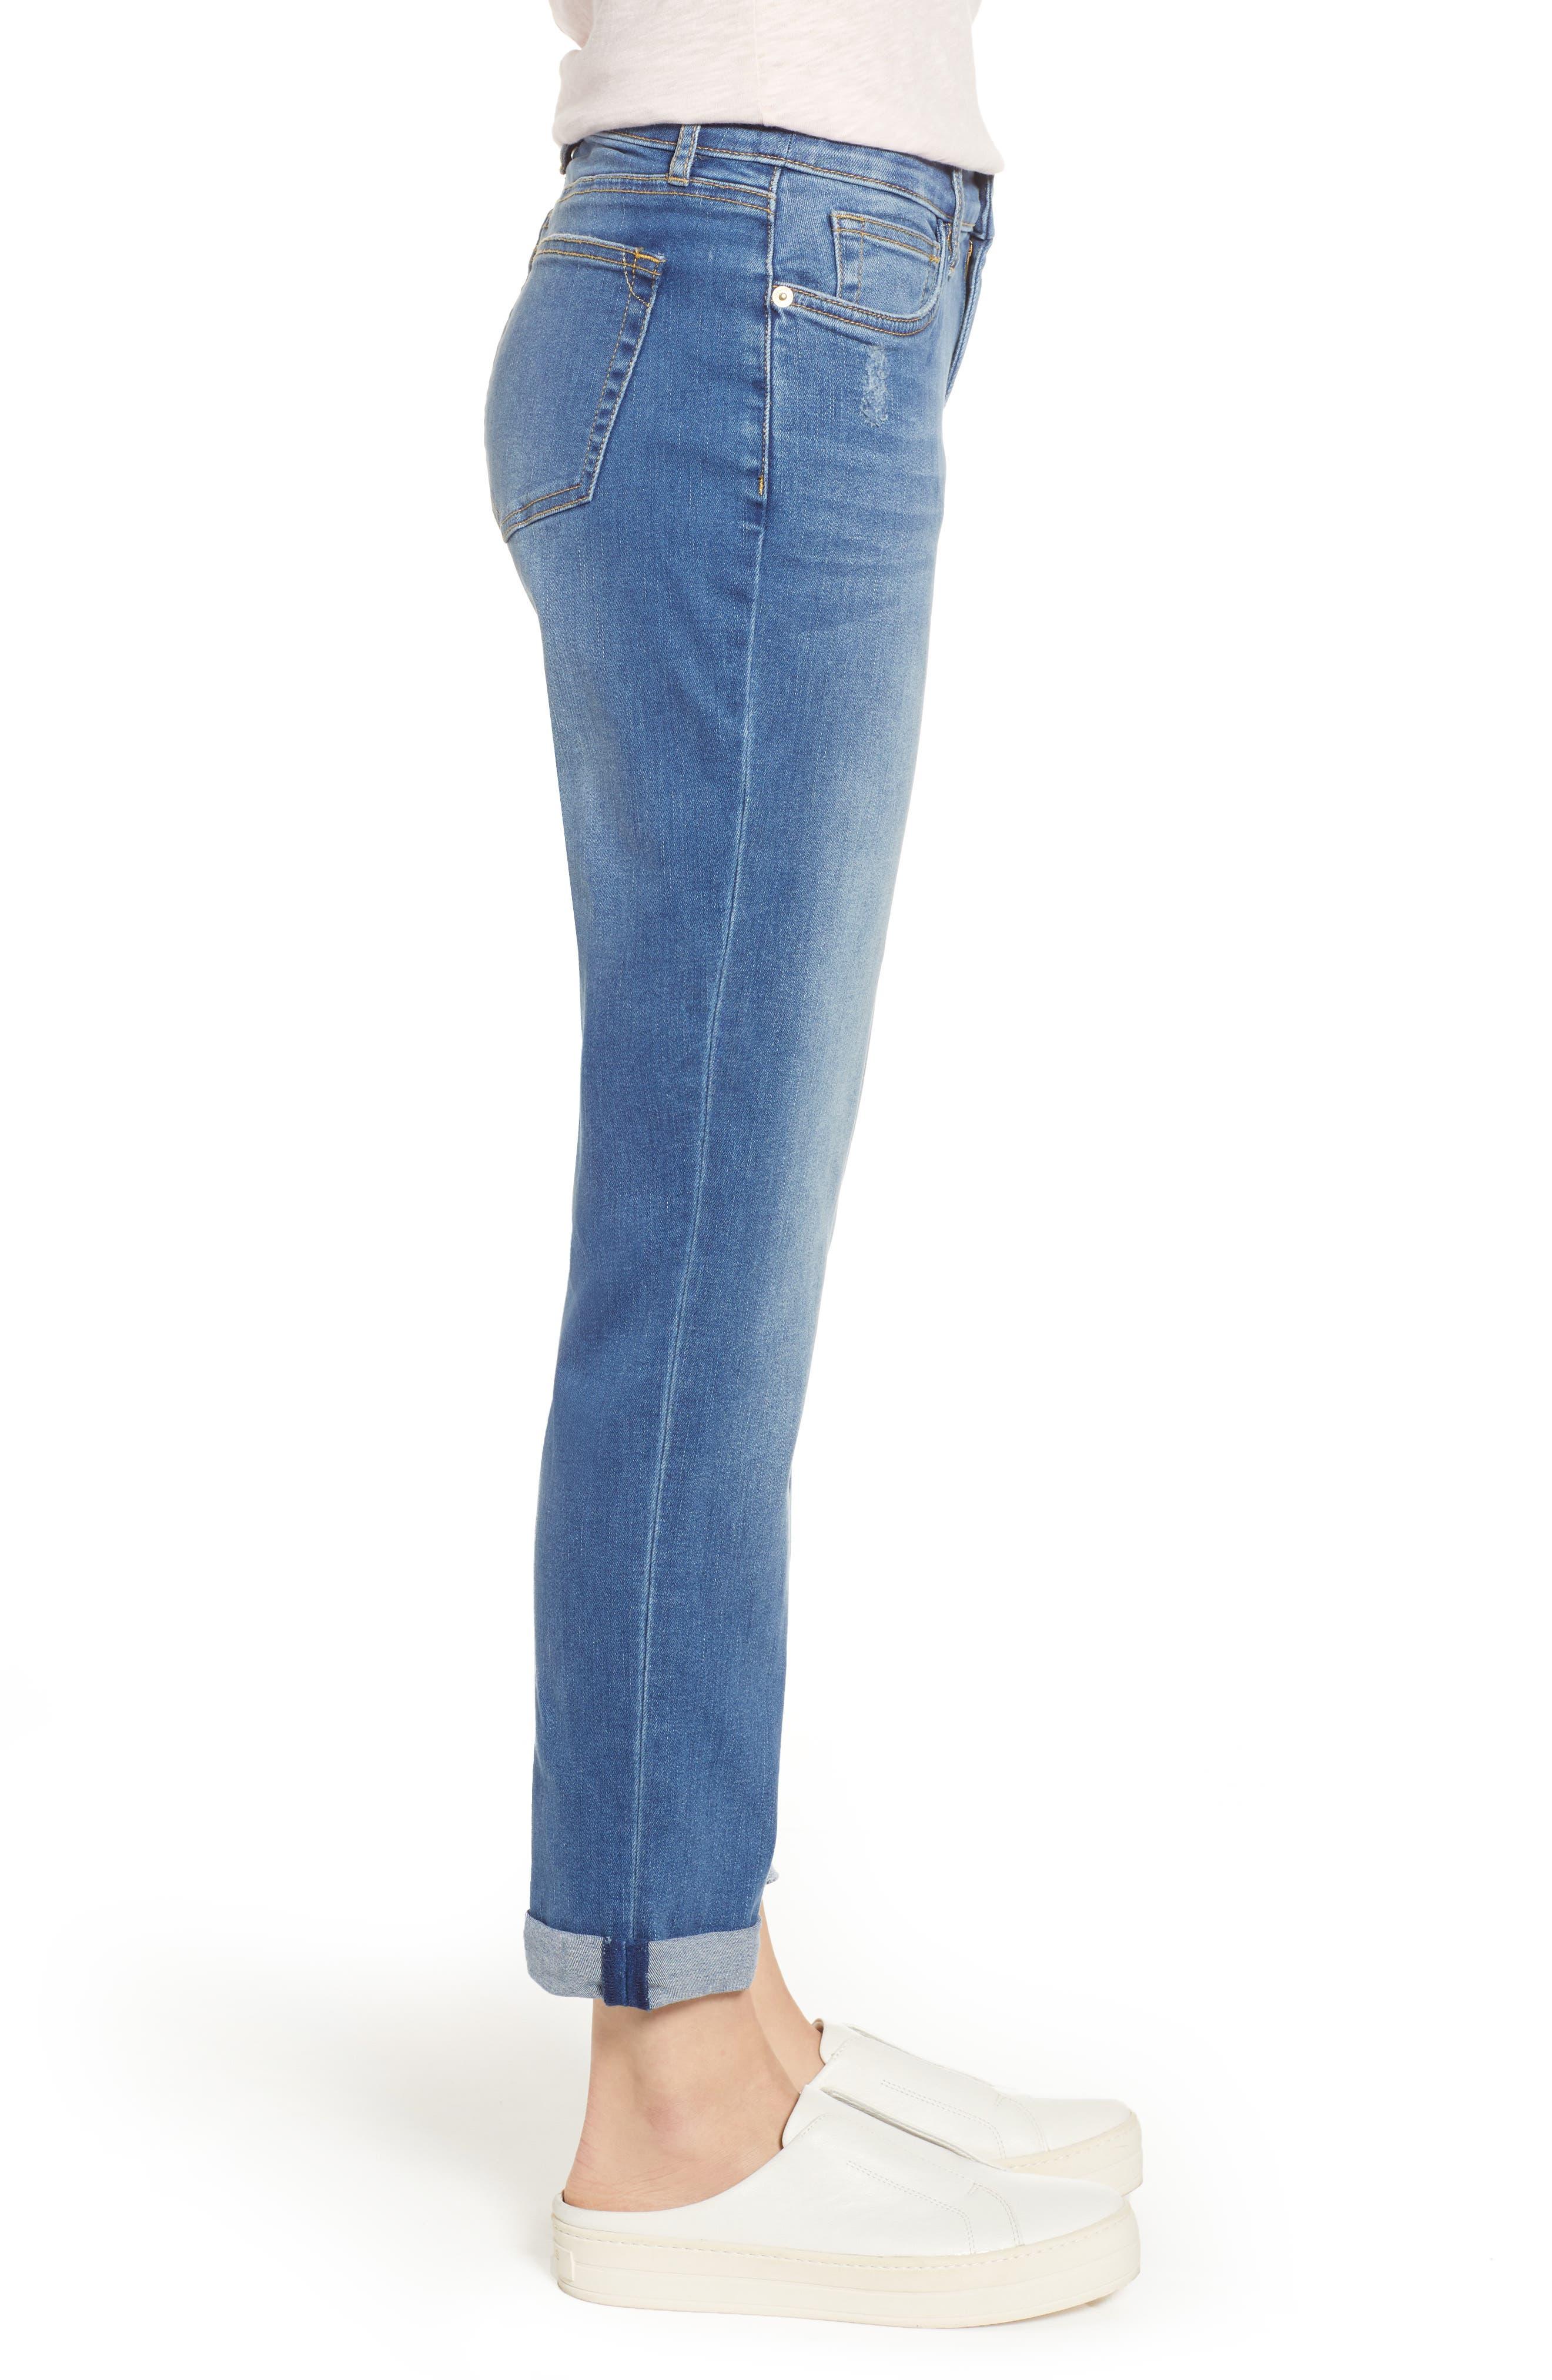 TOMMY BAHAMA, Tema Slim Boyfriend Jeans, Alternate thumbnail 4, color, DARK INDIGO WASH